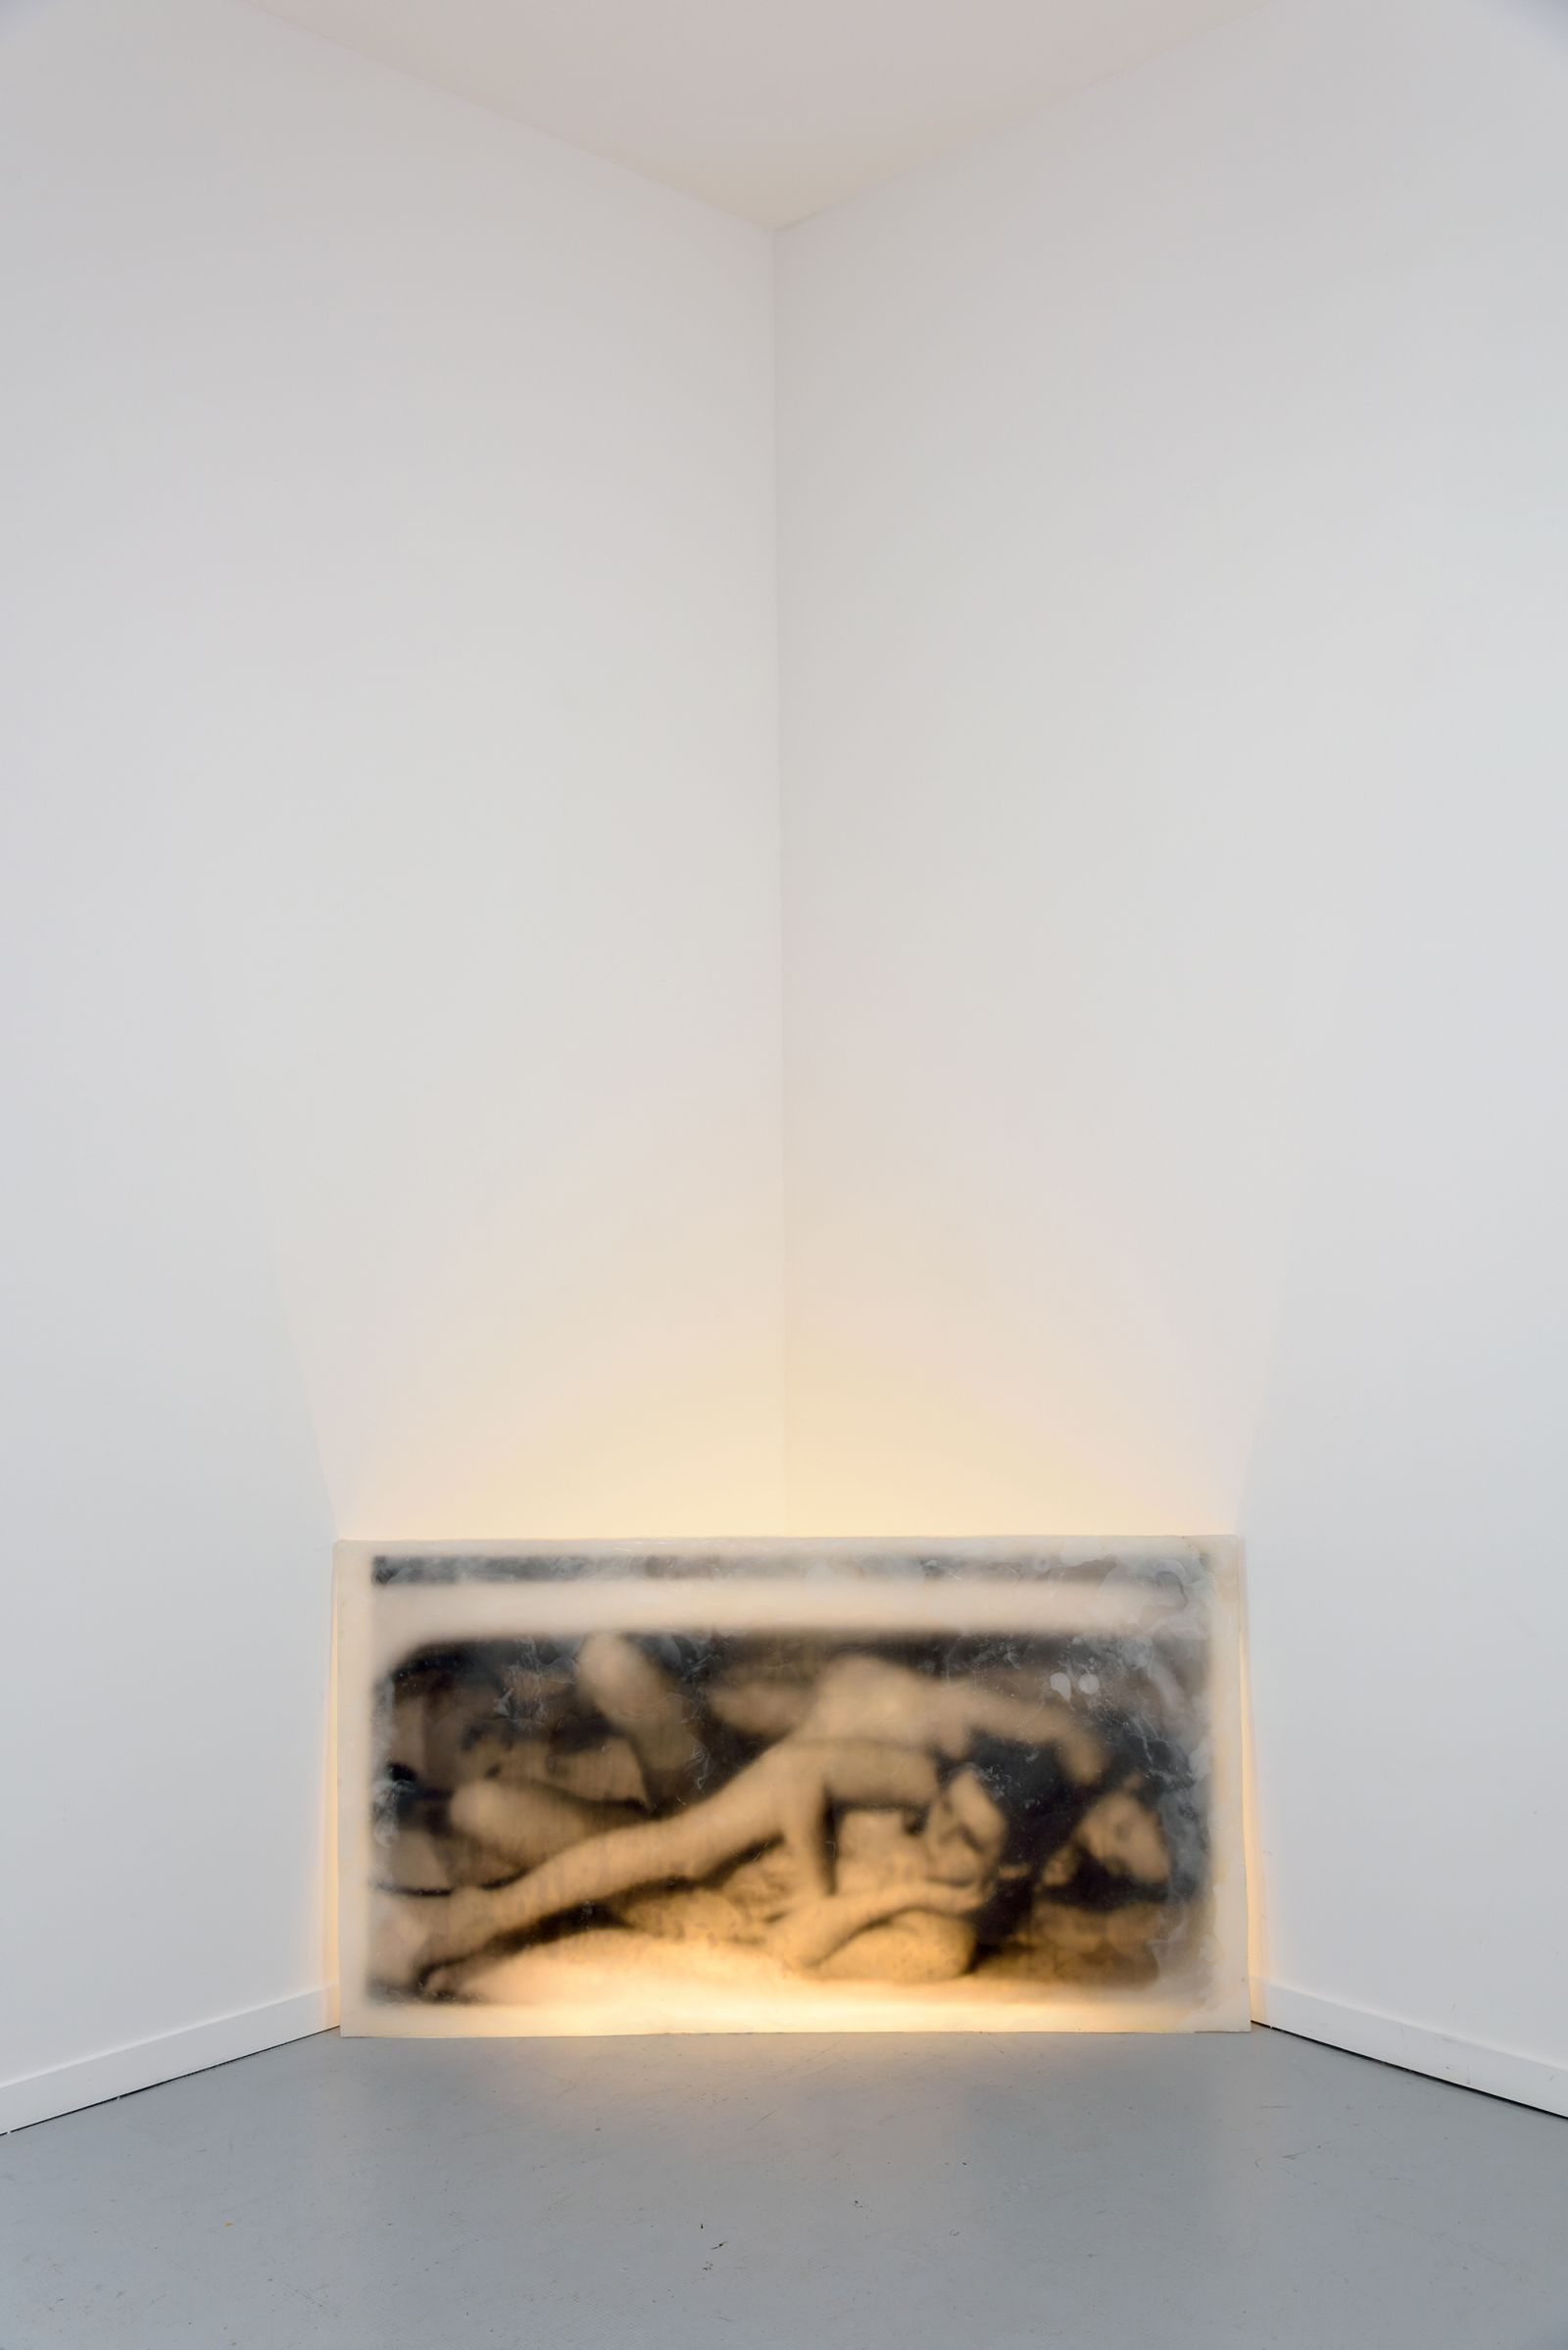 alicia-zaton-umyj-sie-2014-image-emprisonnee-dans-une-plaque-de-cire-paraffine-eclairage-fluo-69x128cm-19c0943c05731fc7012eeaed0d93928e